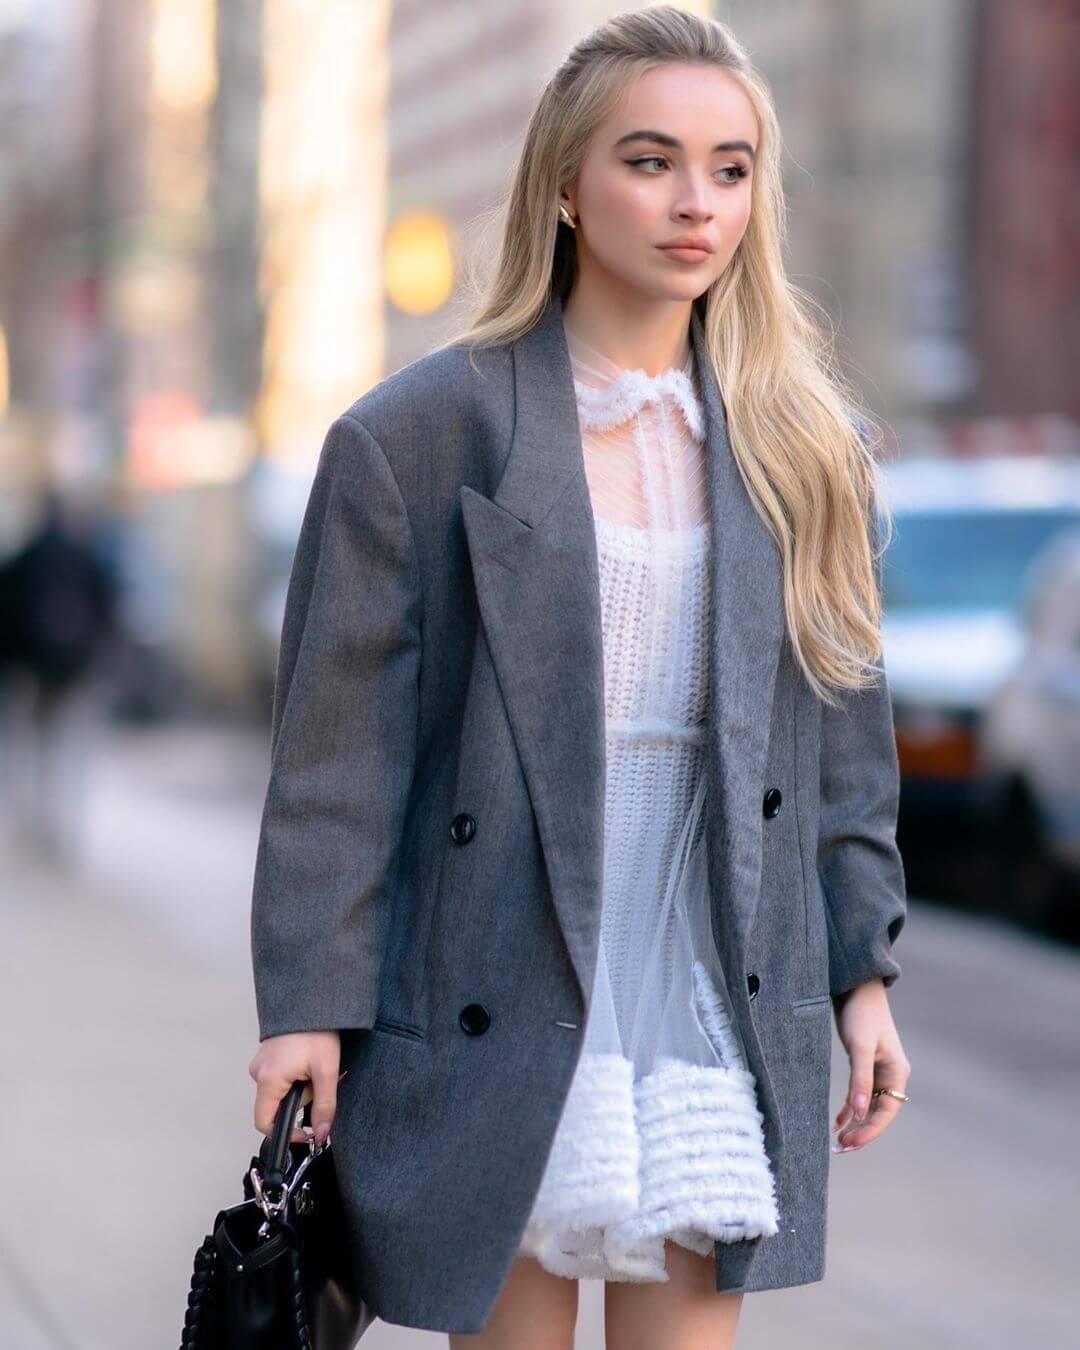 Sabrina Carpenter net worth and life style